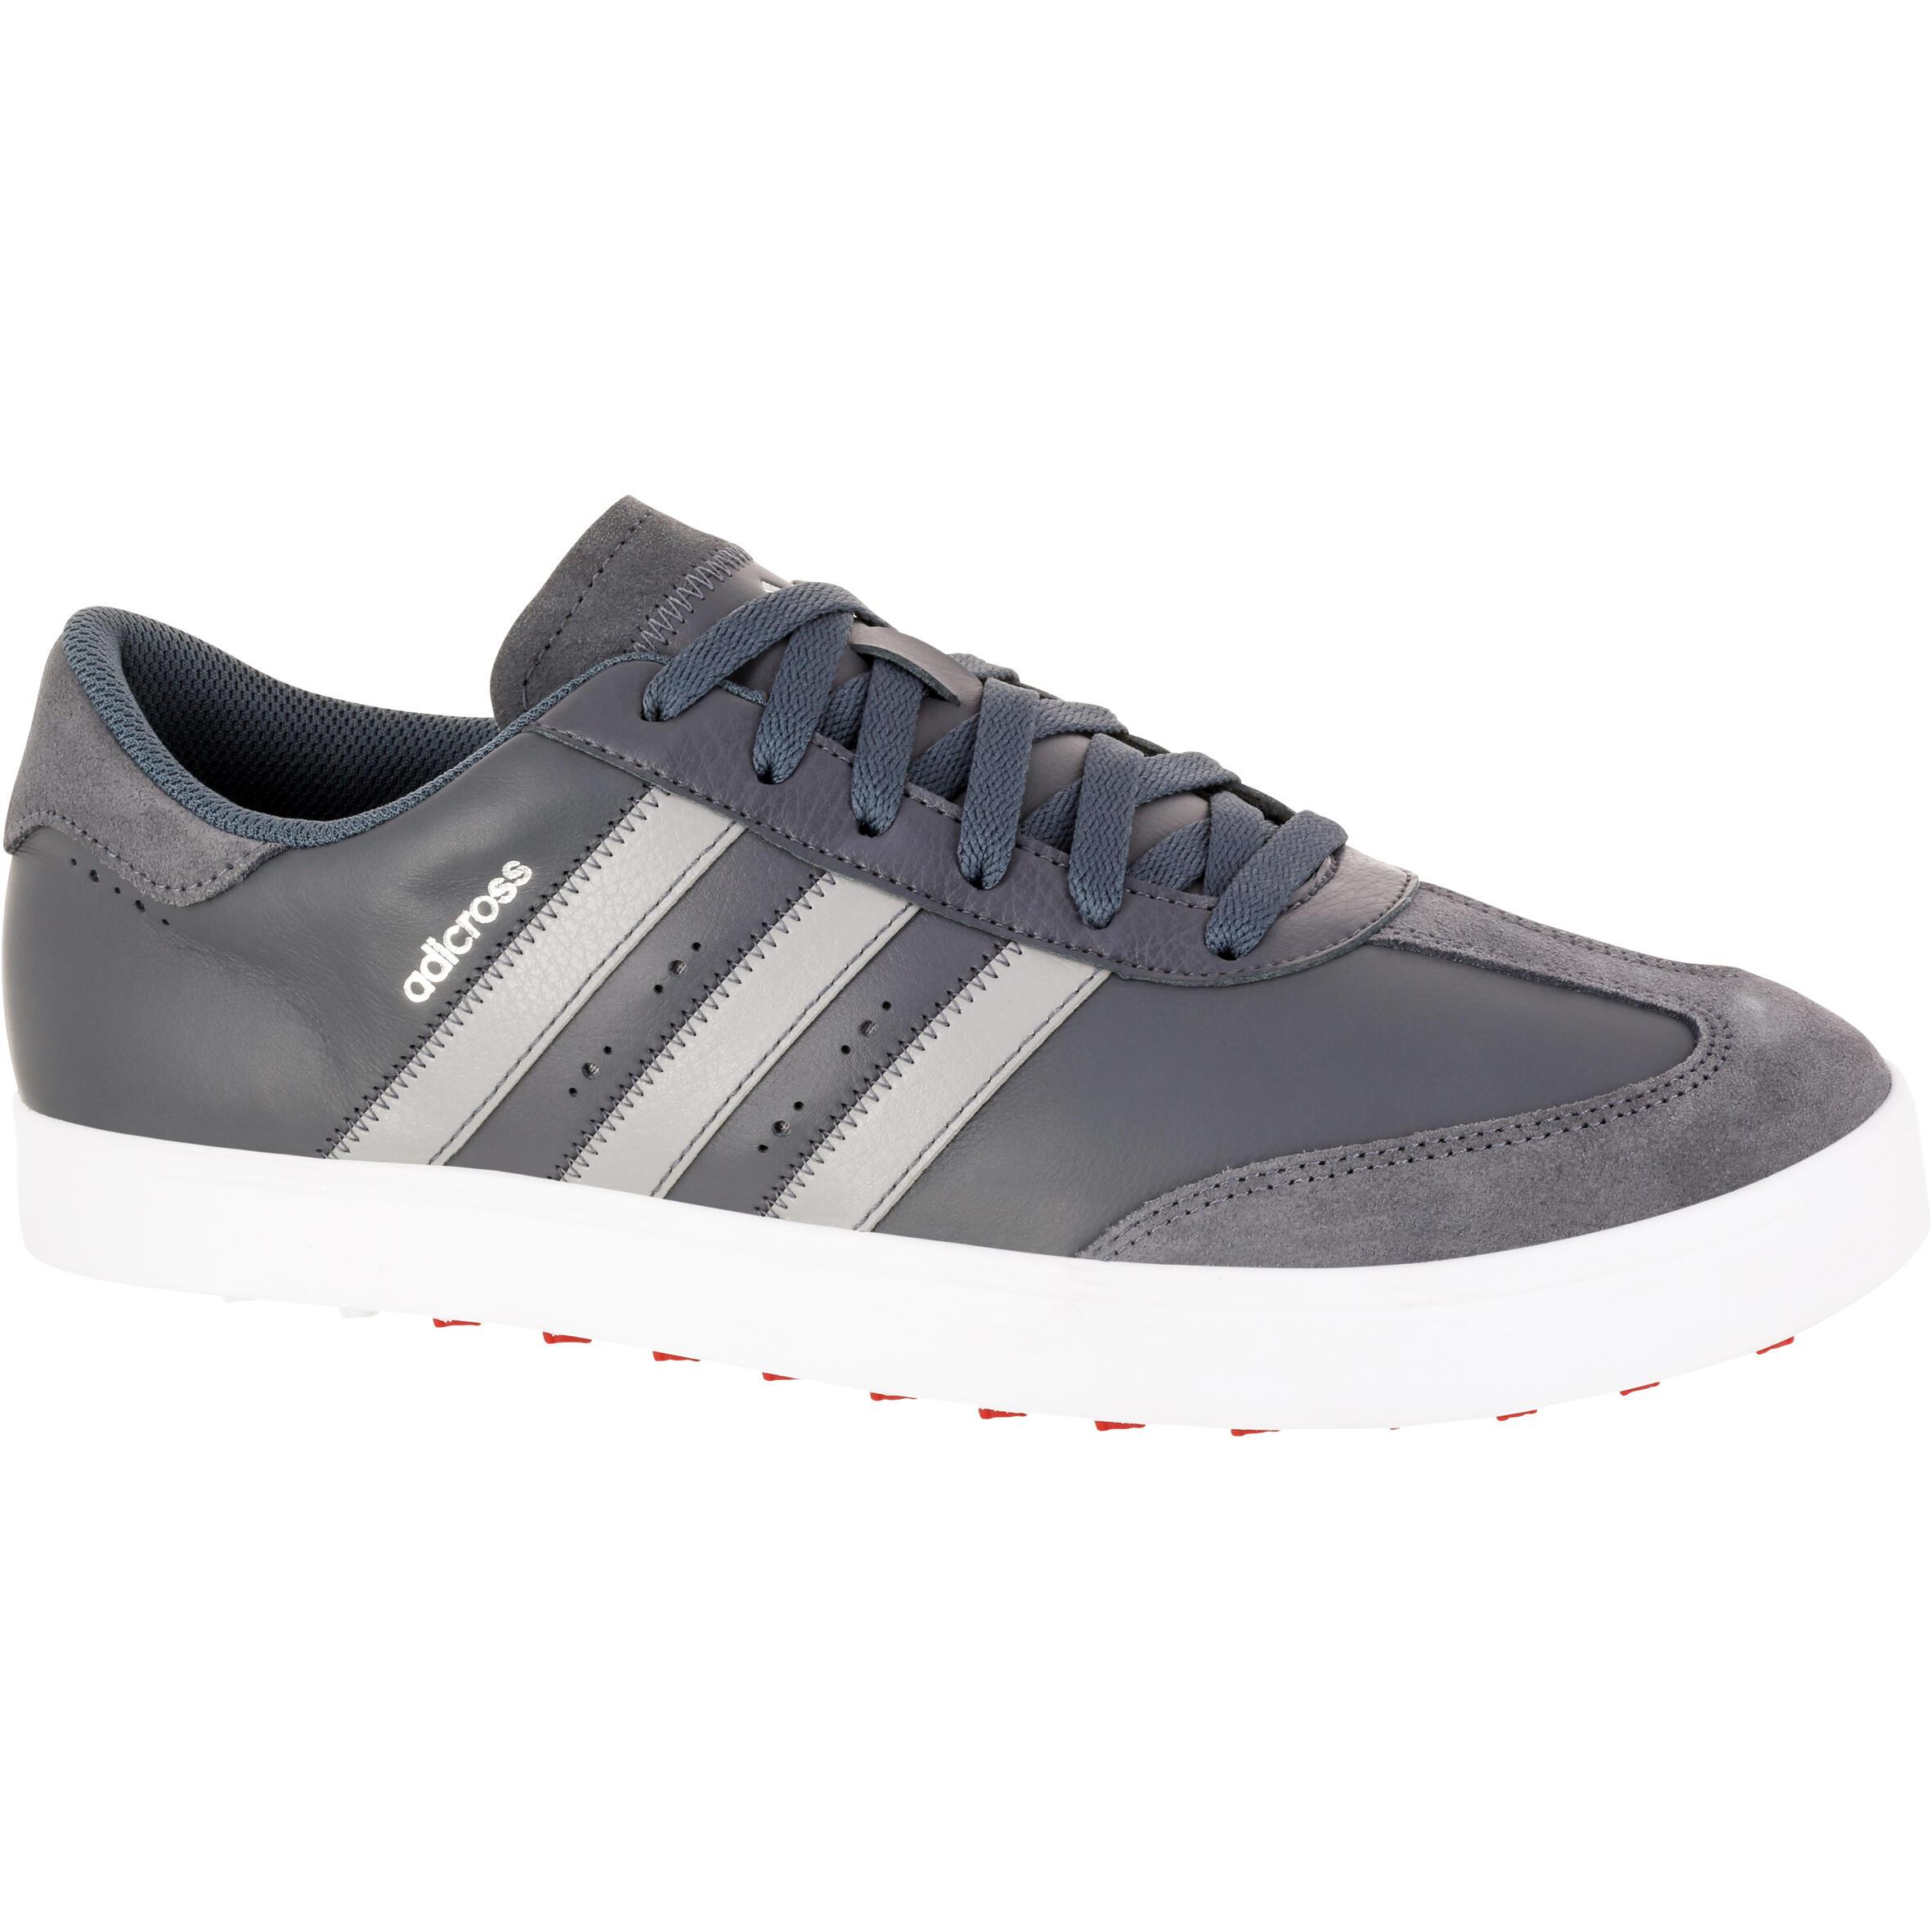 Adidas Golfschoenen Adicross V voor heren grijs thumbnail